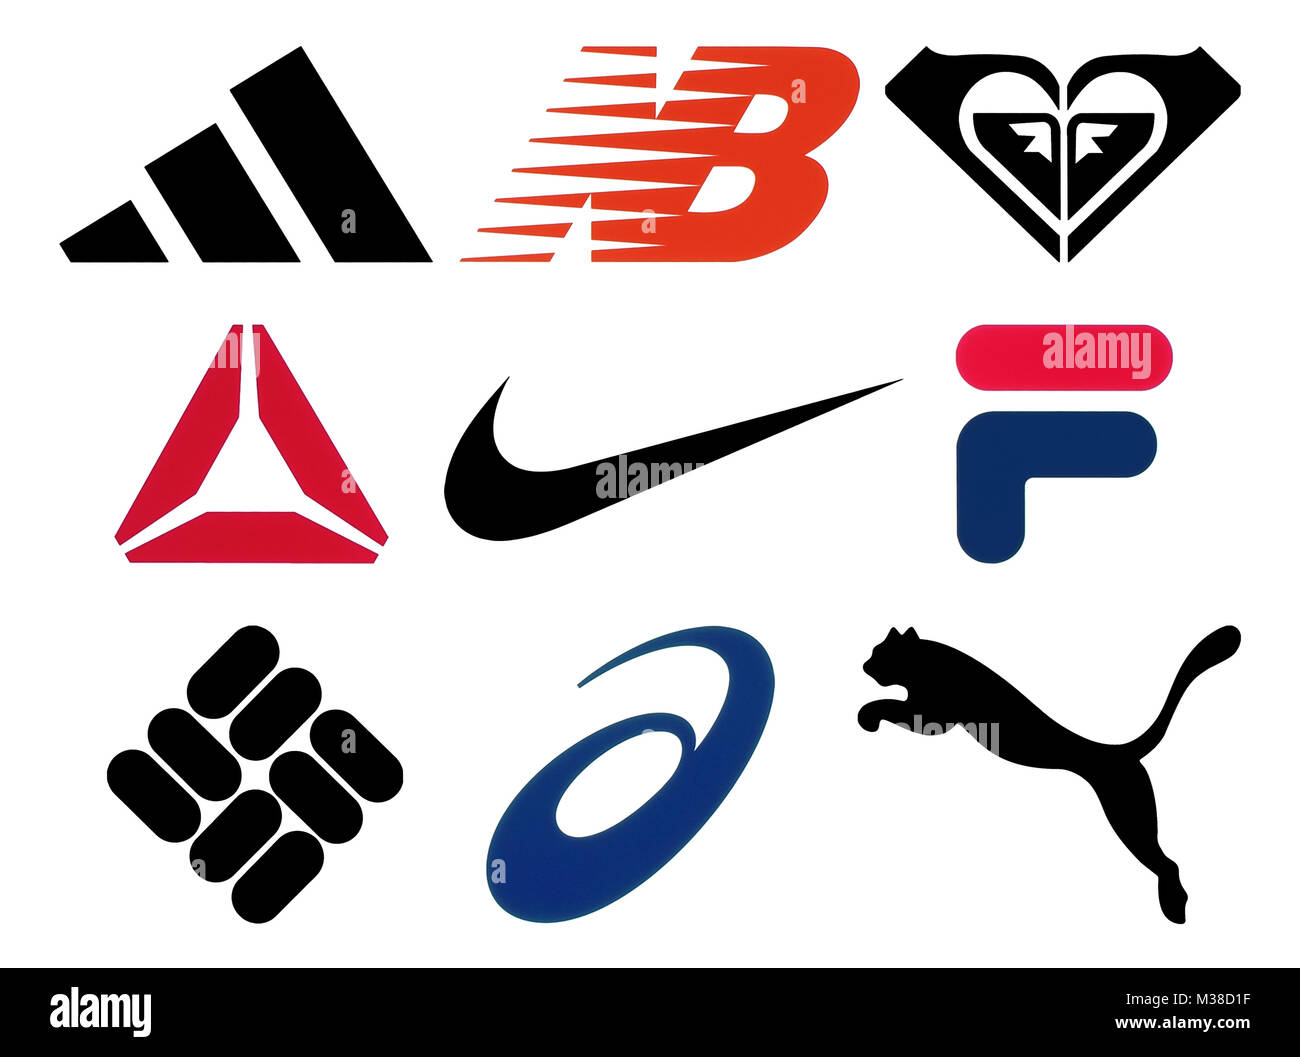 Kiev, Ukraine - October 27, 2017: Set of popular sportswear manufactures logos printed on paper: Adidas, New Balance, Stock Photo